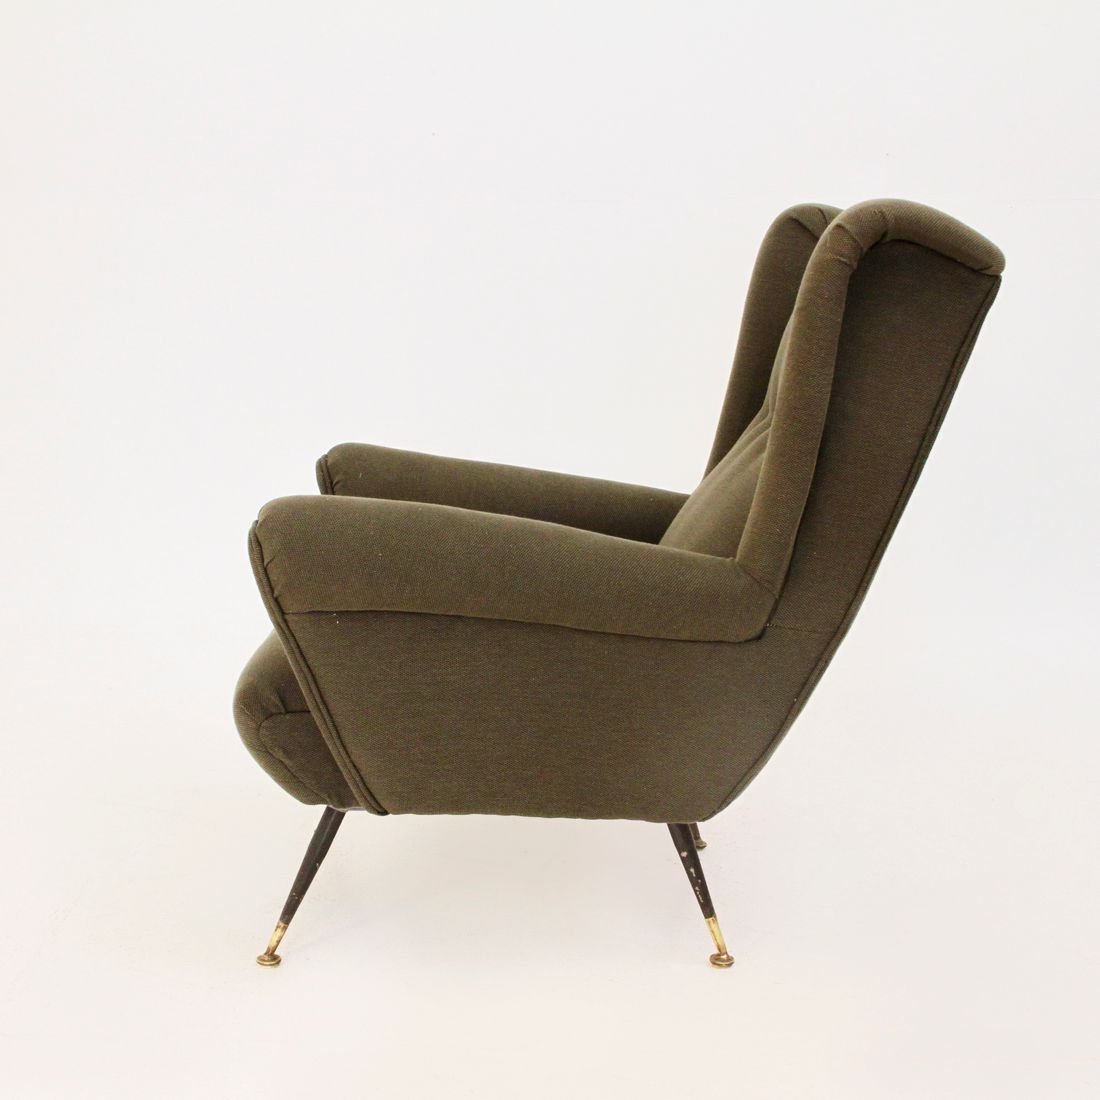 Mid Century Italian Military Green Armchair 1950s For